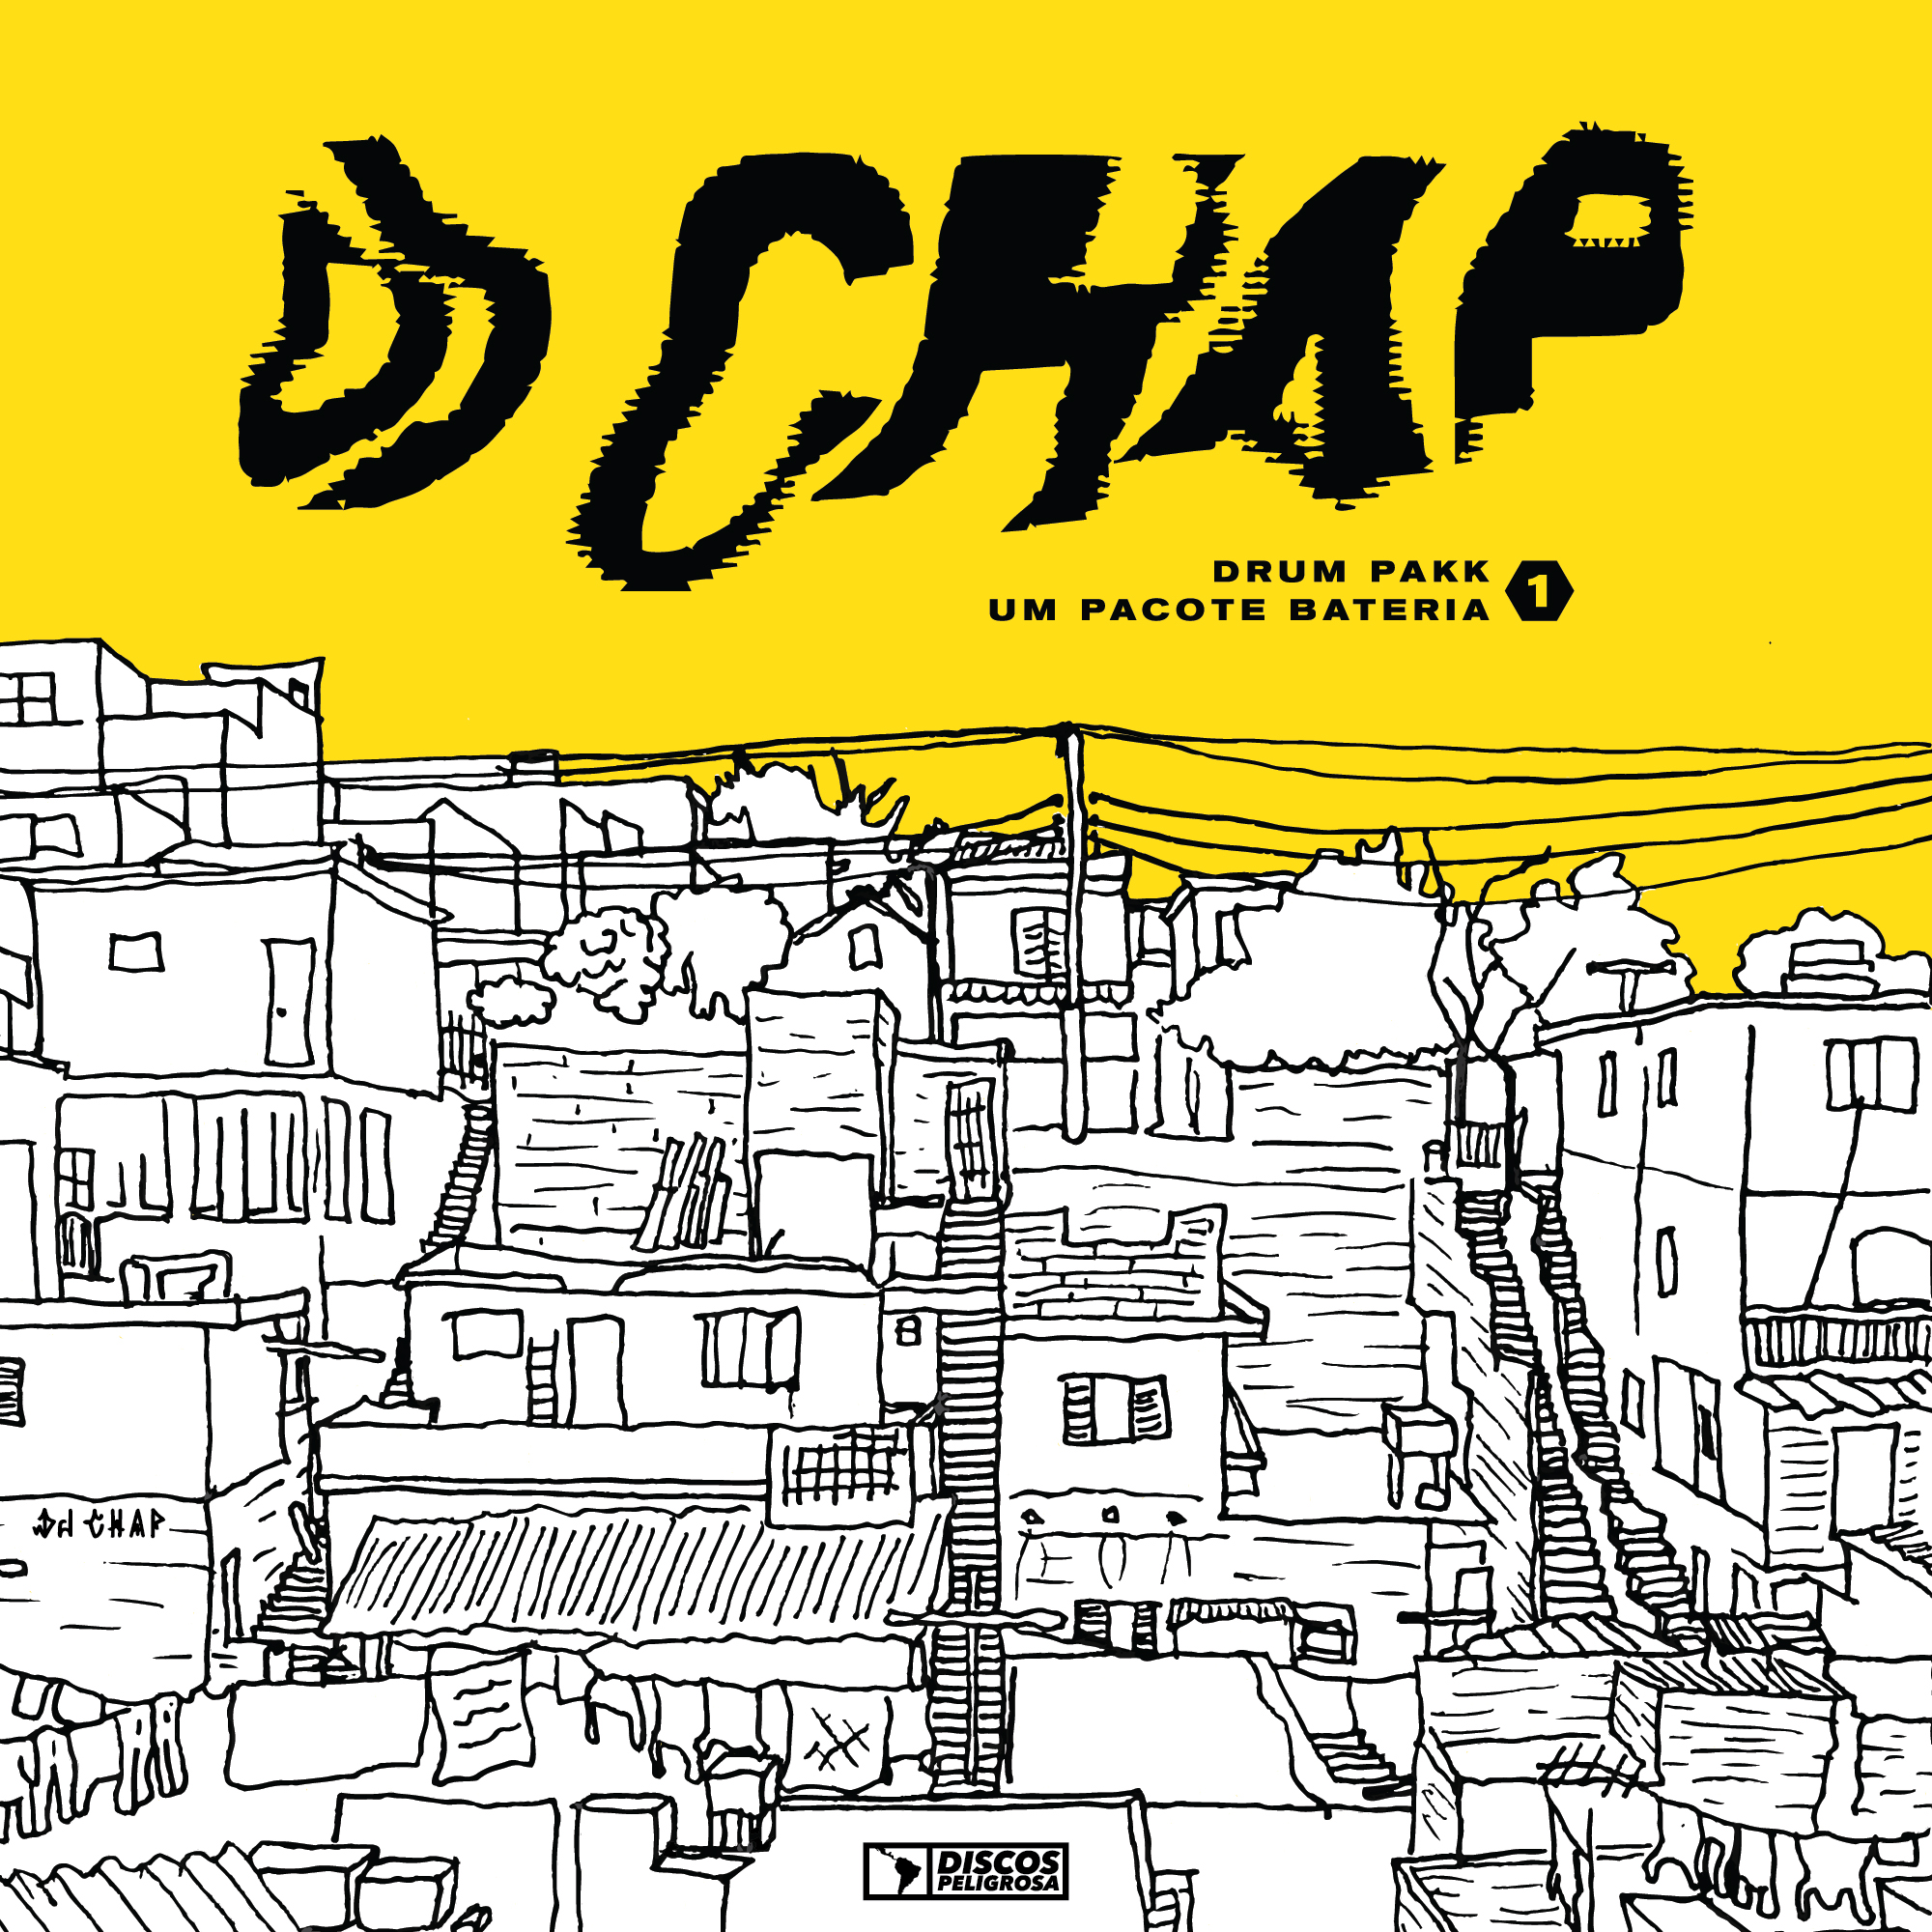 Drum Pakk 1 - Dj Chap